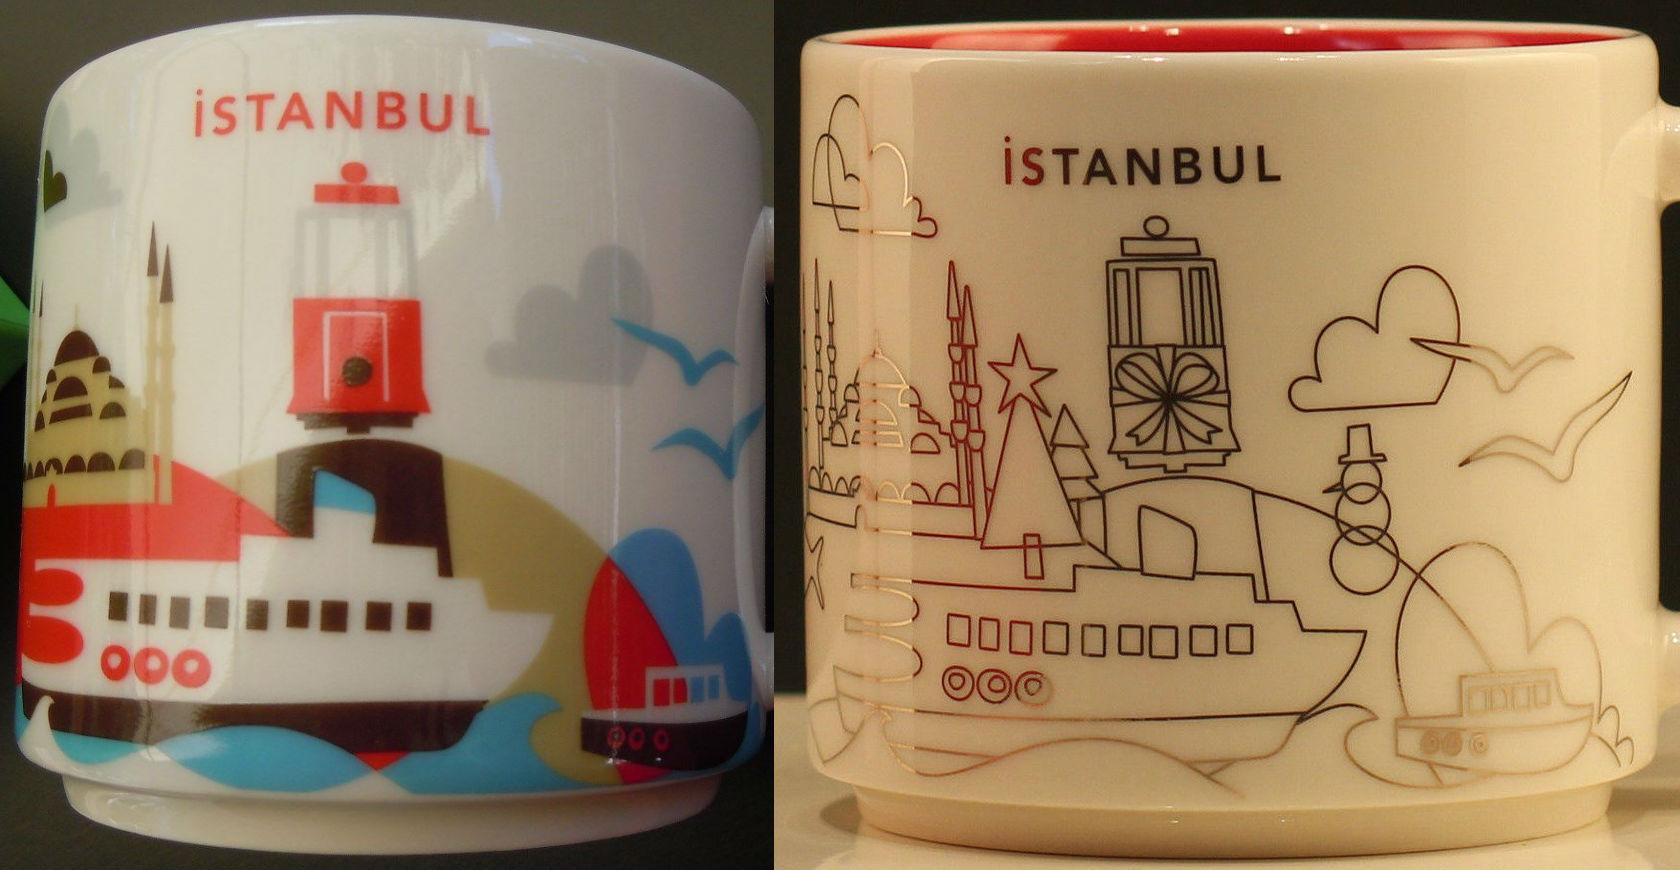 yah_istanbul_comparison